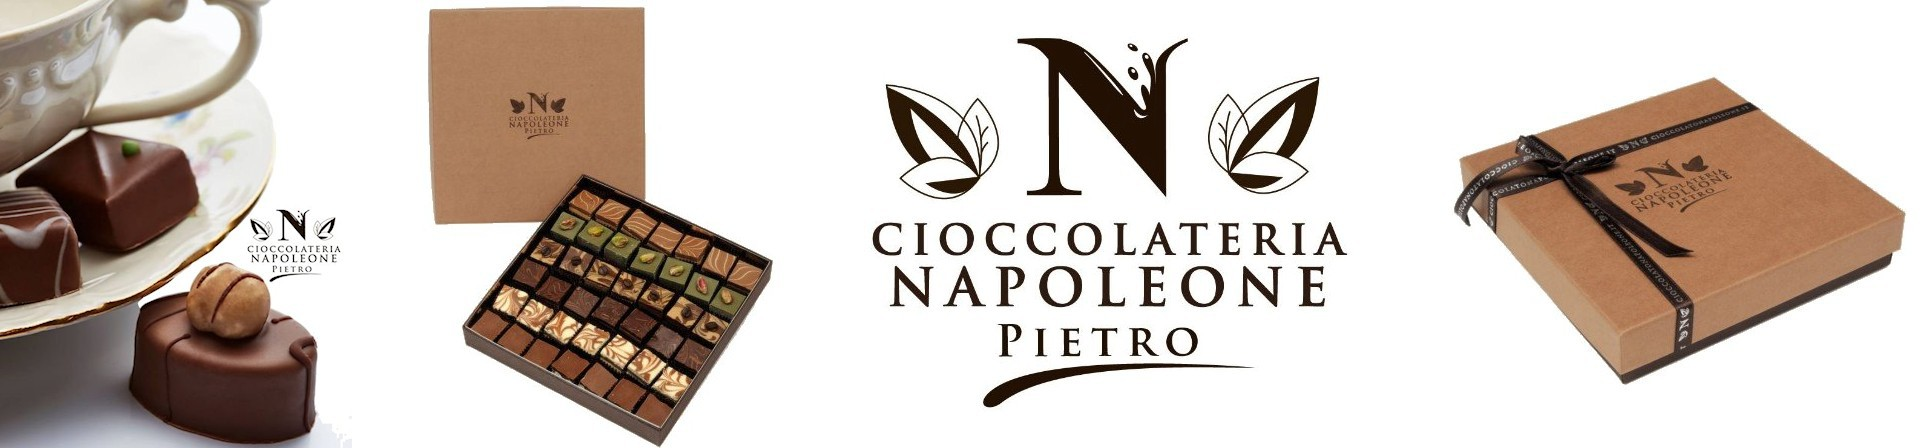 cioccolatini, praline, tavolette - Cioccolateria Napoleone Pietro